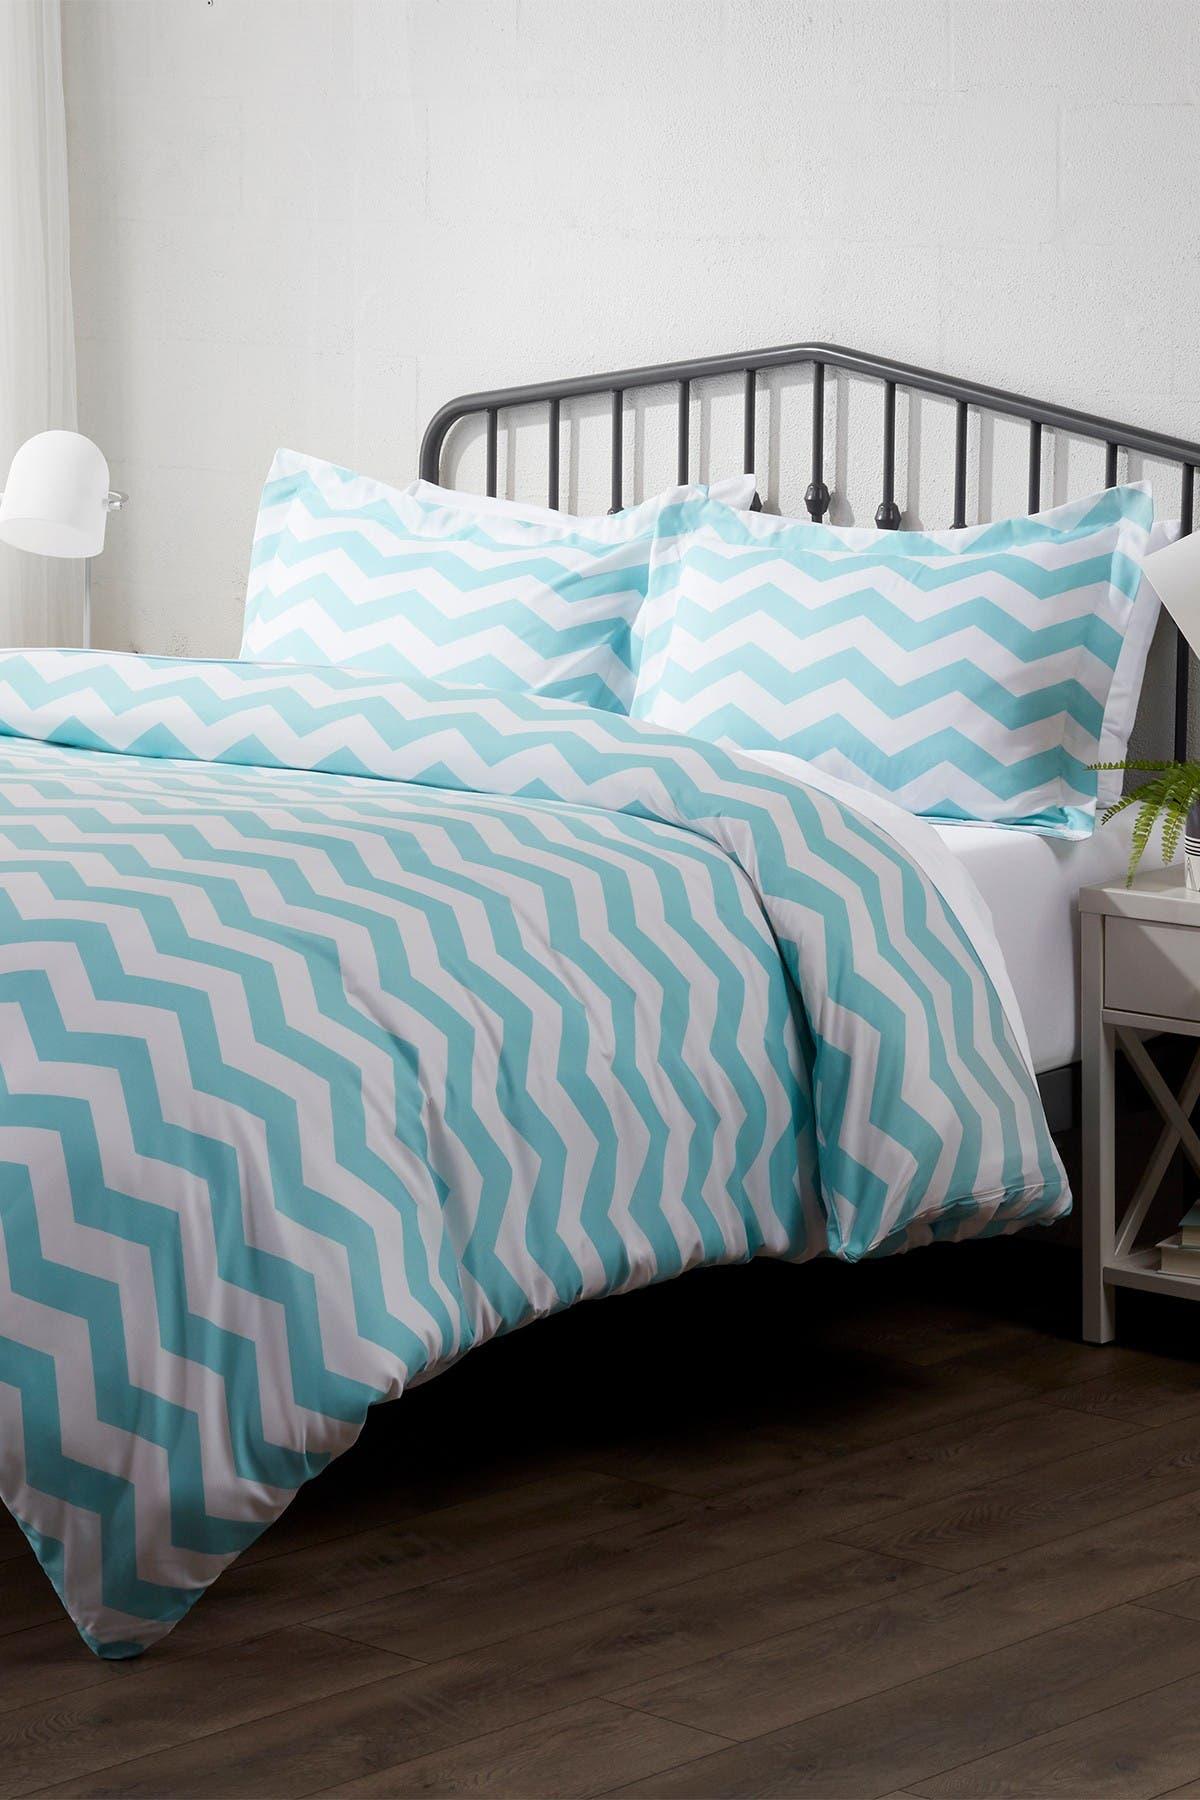 Image of IENJOY HOME Home Spun Premium Ultra Soft Arrow Pattern 3-Piece Queen Duvet Cover Set - Turquoise